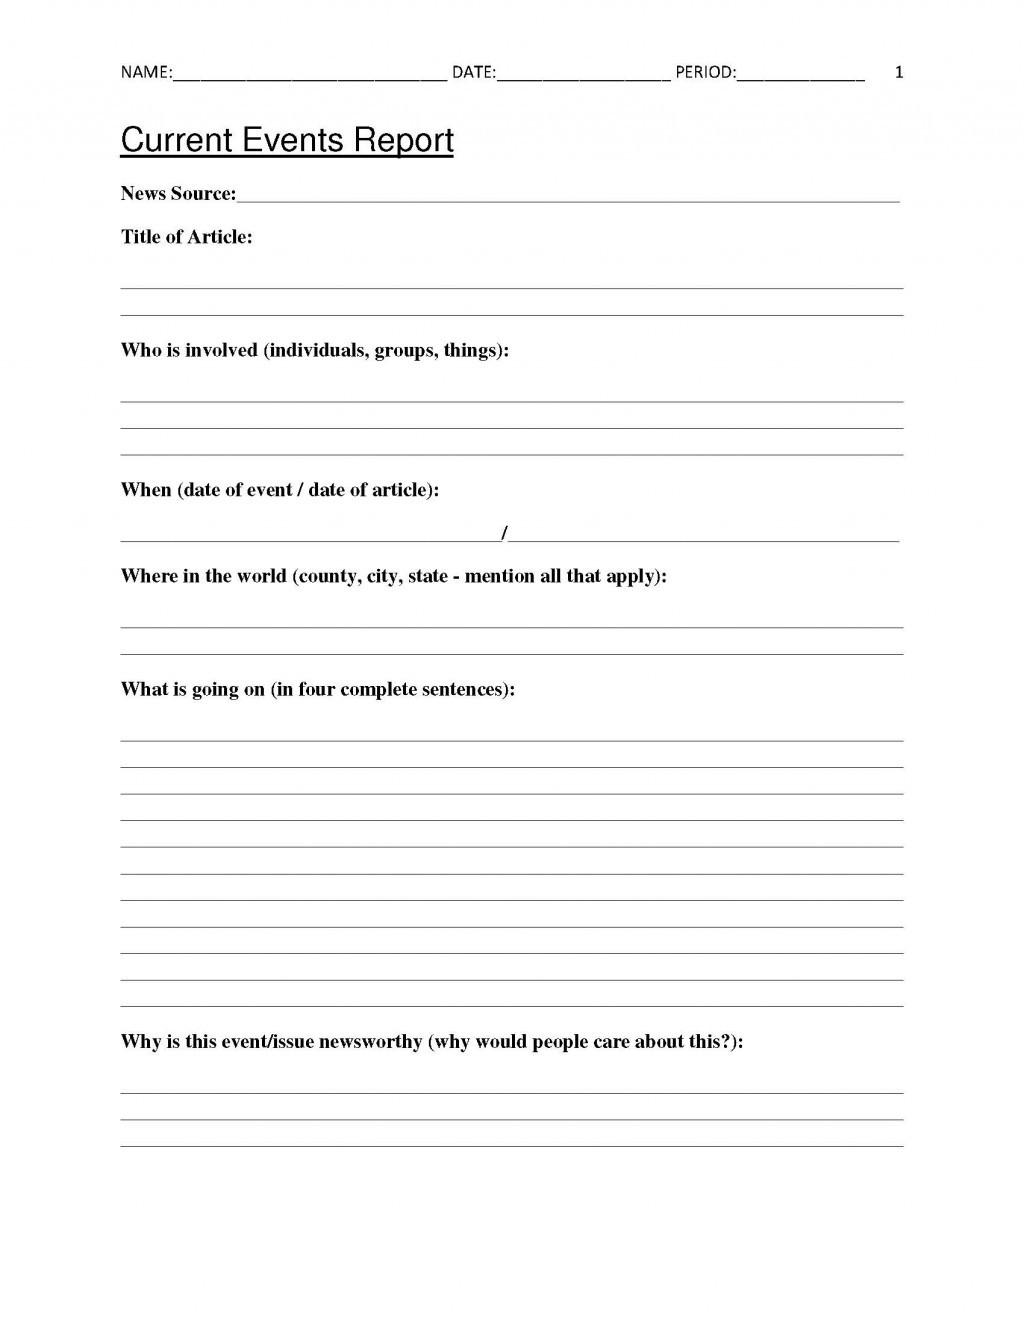 Cnn Students News Worksheet Cnn 10 Current event Worksheet